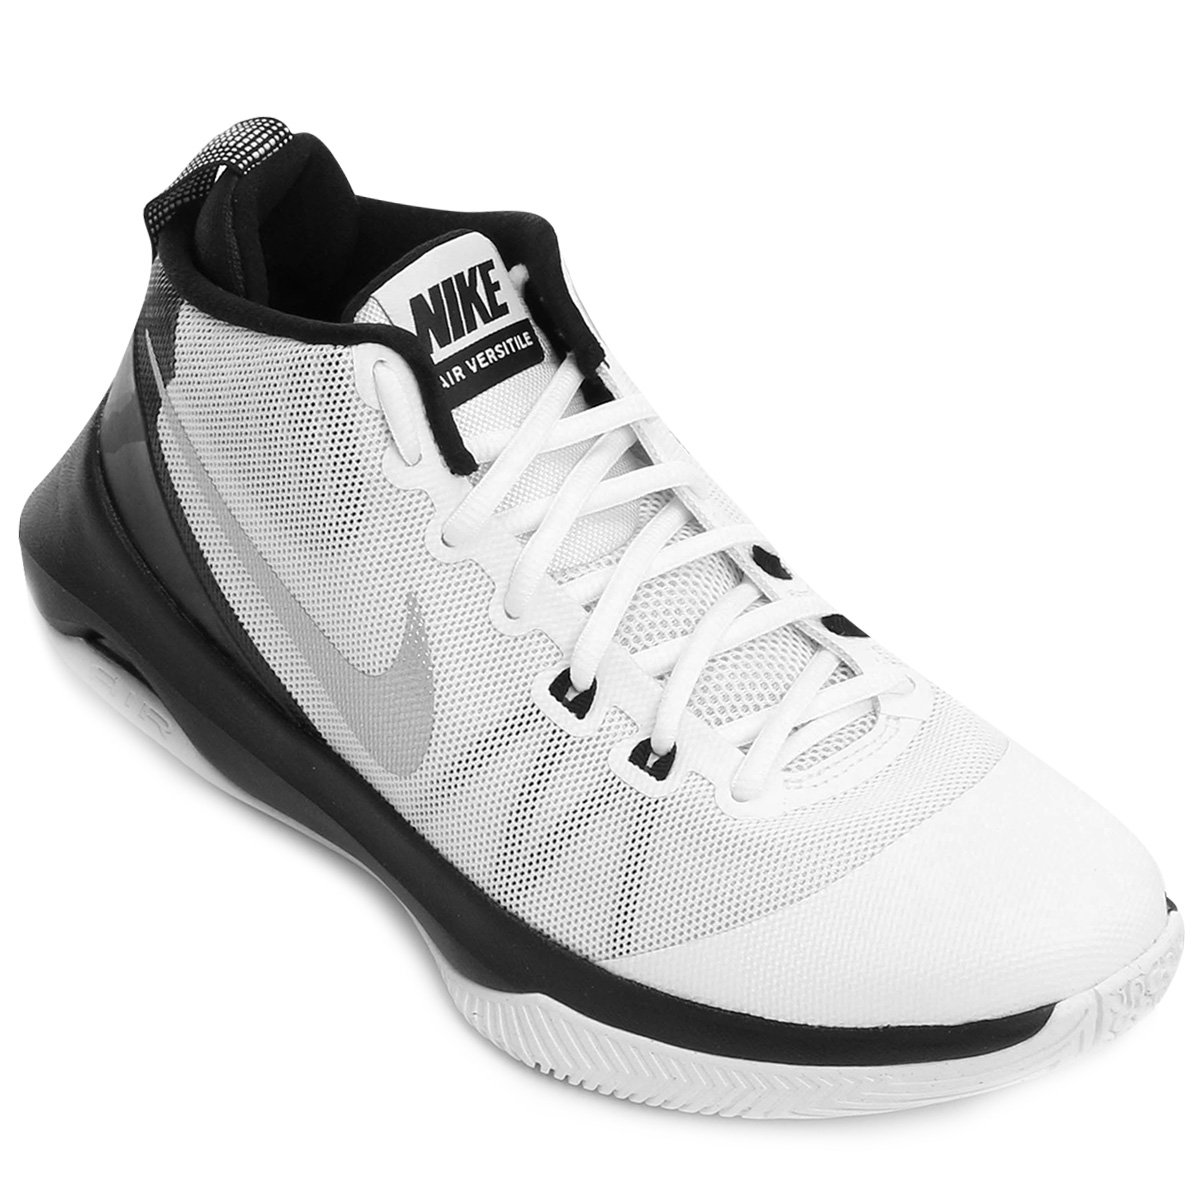 Tênis Nike Air Versitile Masculino - Branco e Preto - Compre Agora ... 552ca2dec04d3